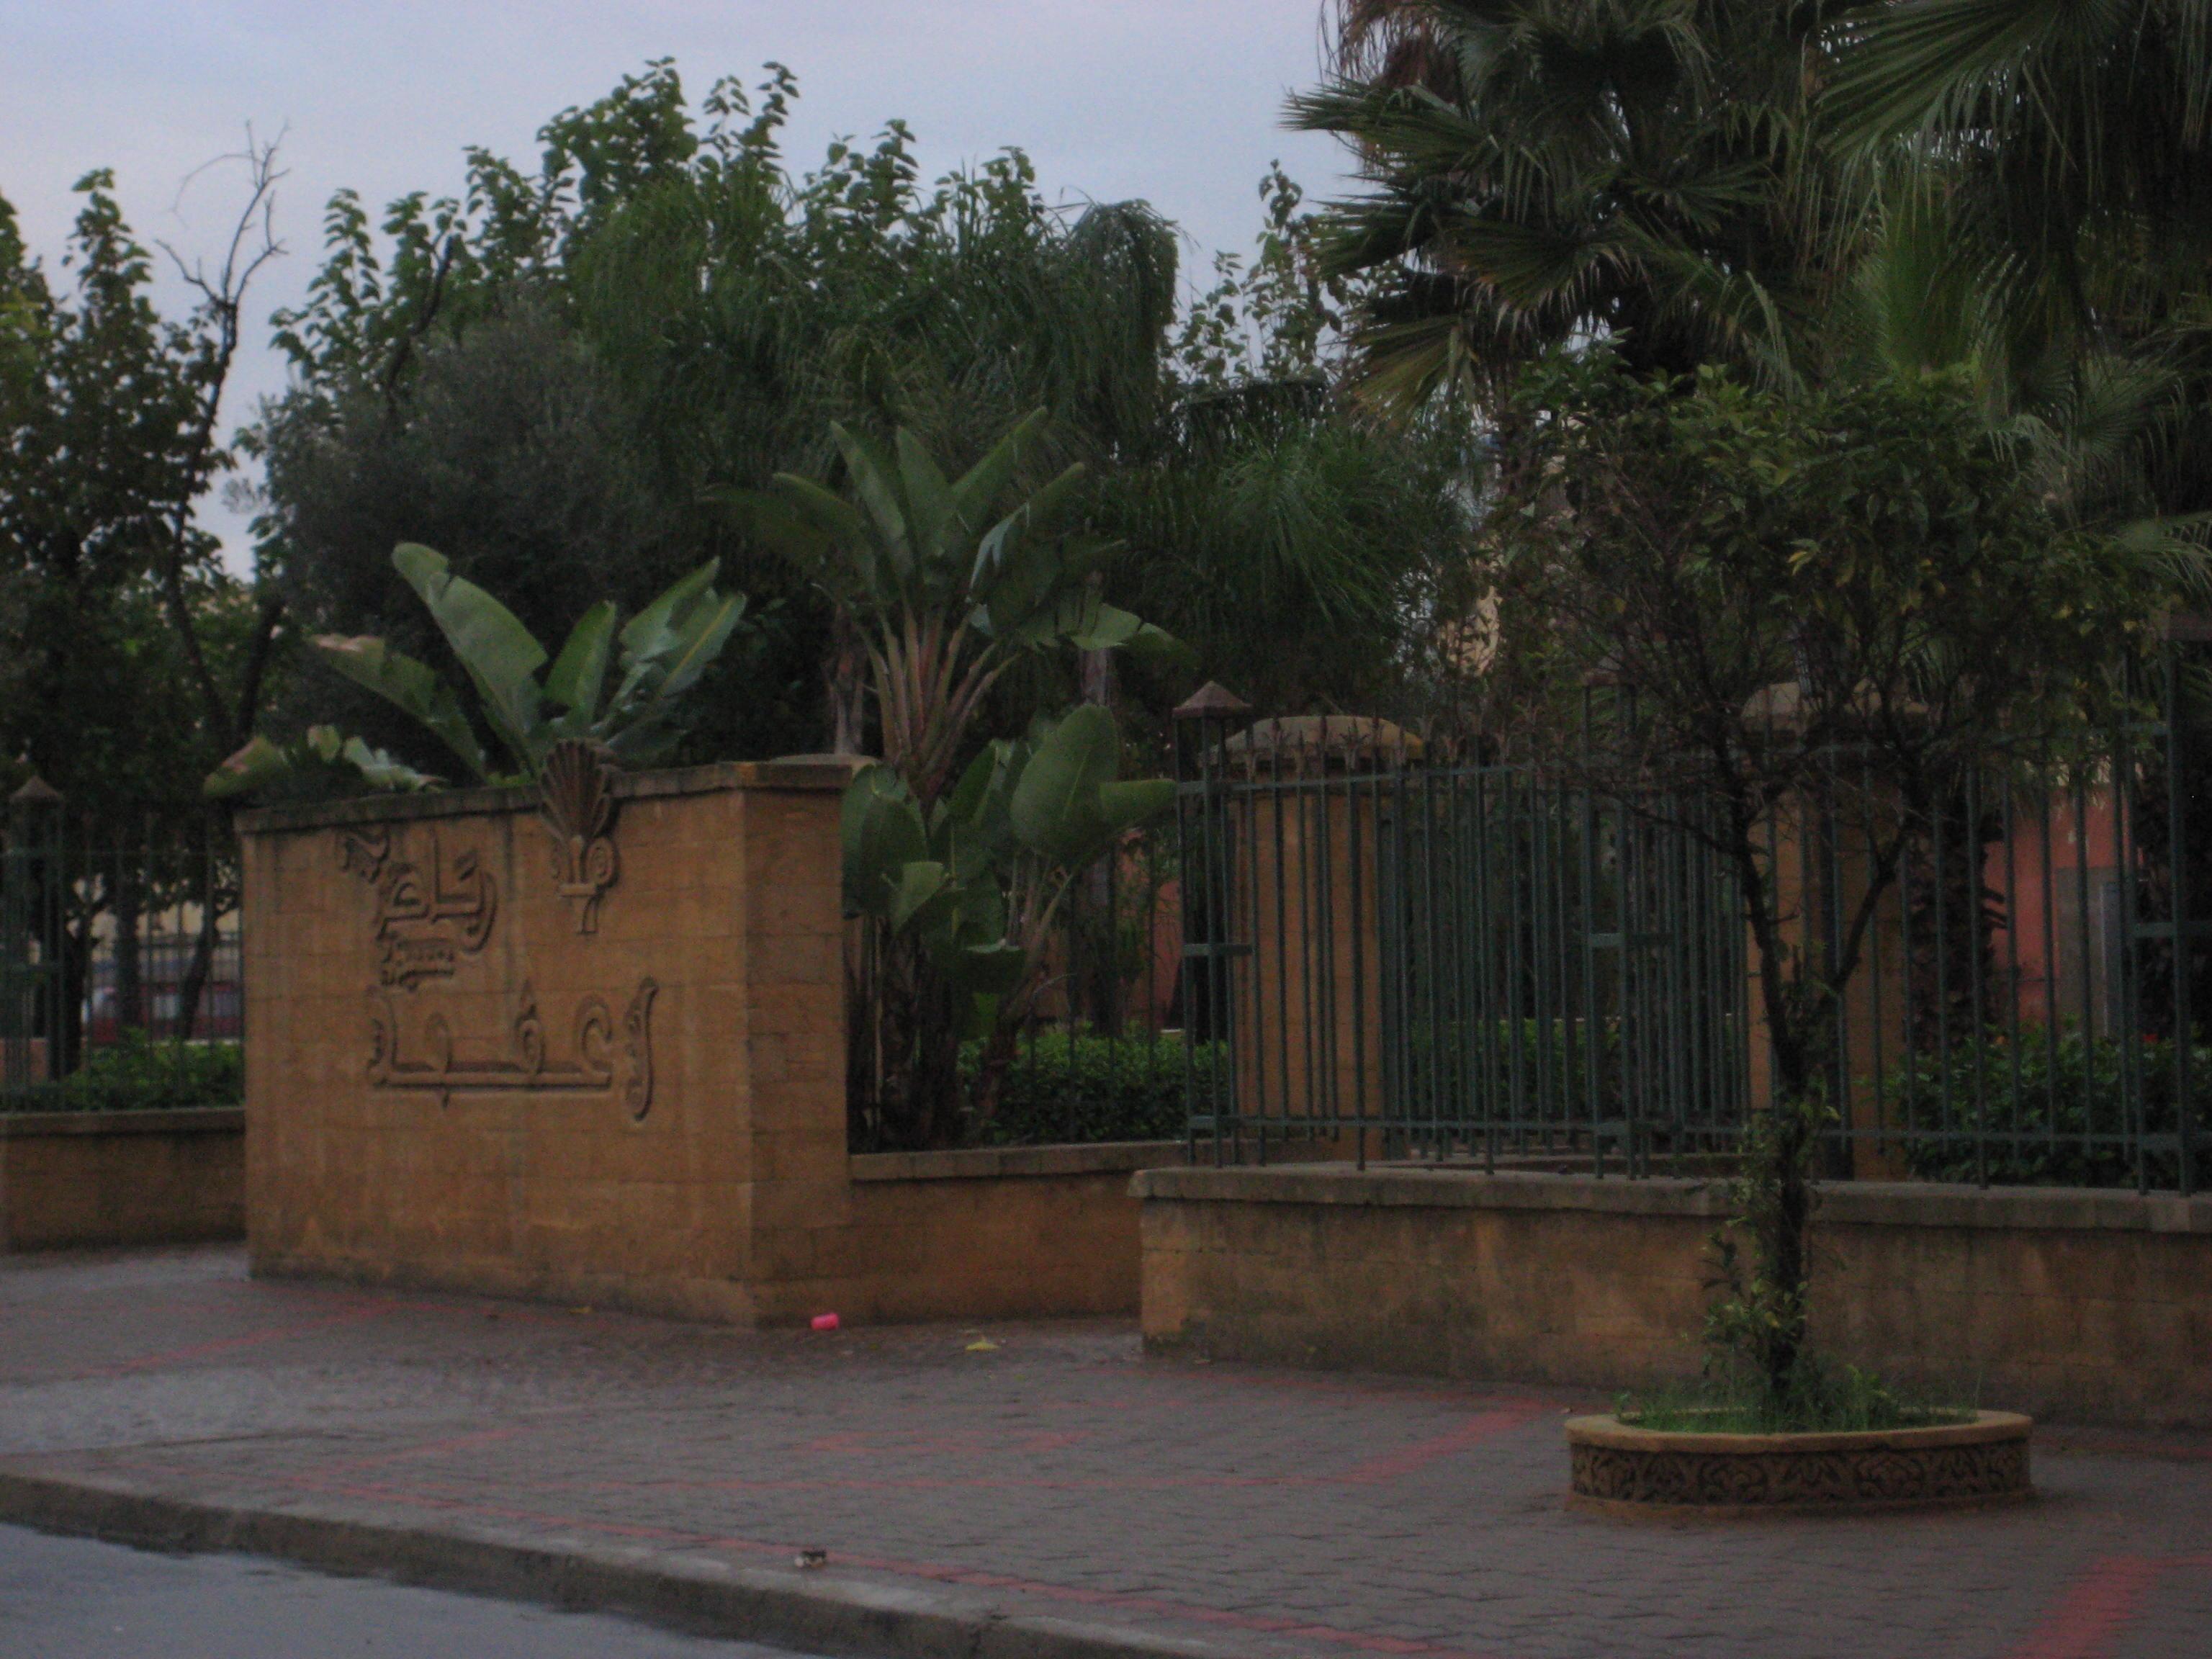 Fond D Ecran Image Casablanca Maroc Photo De Ht